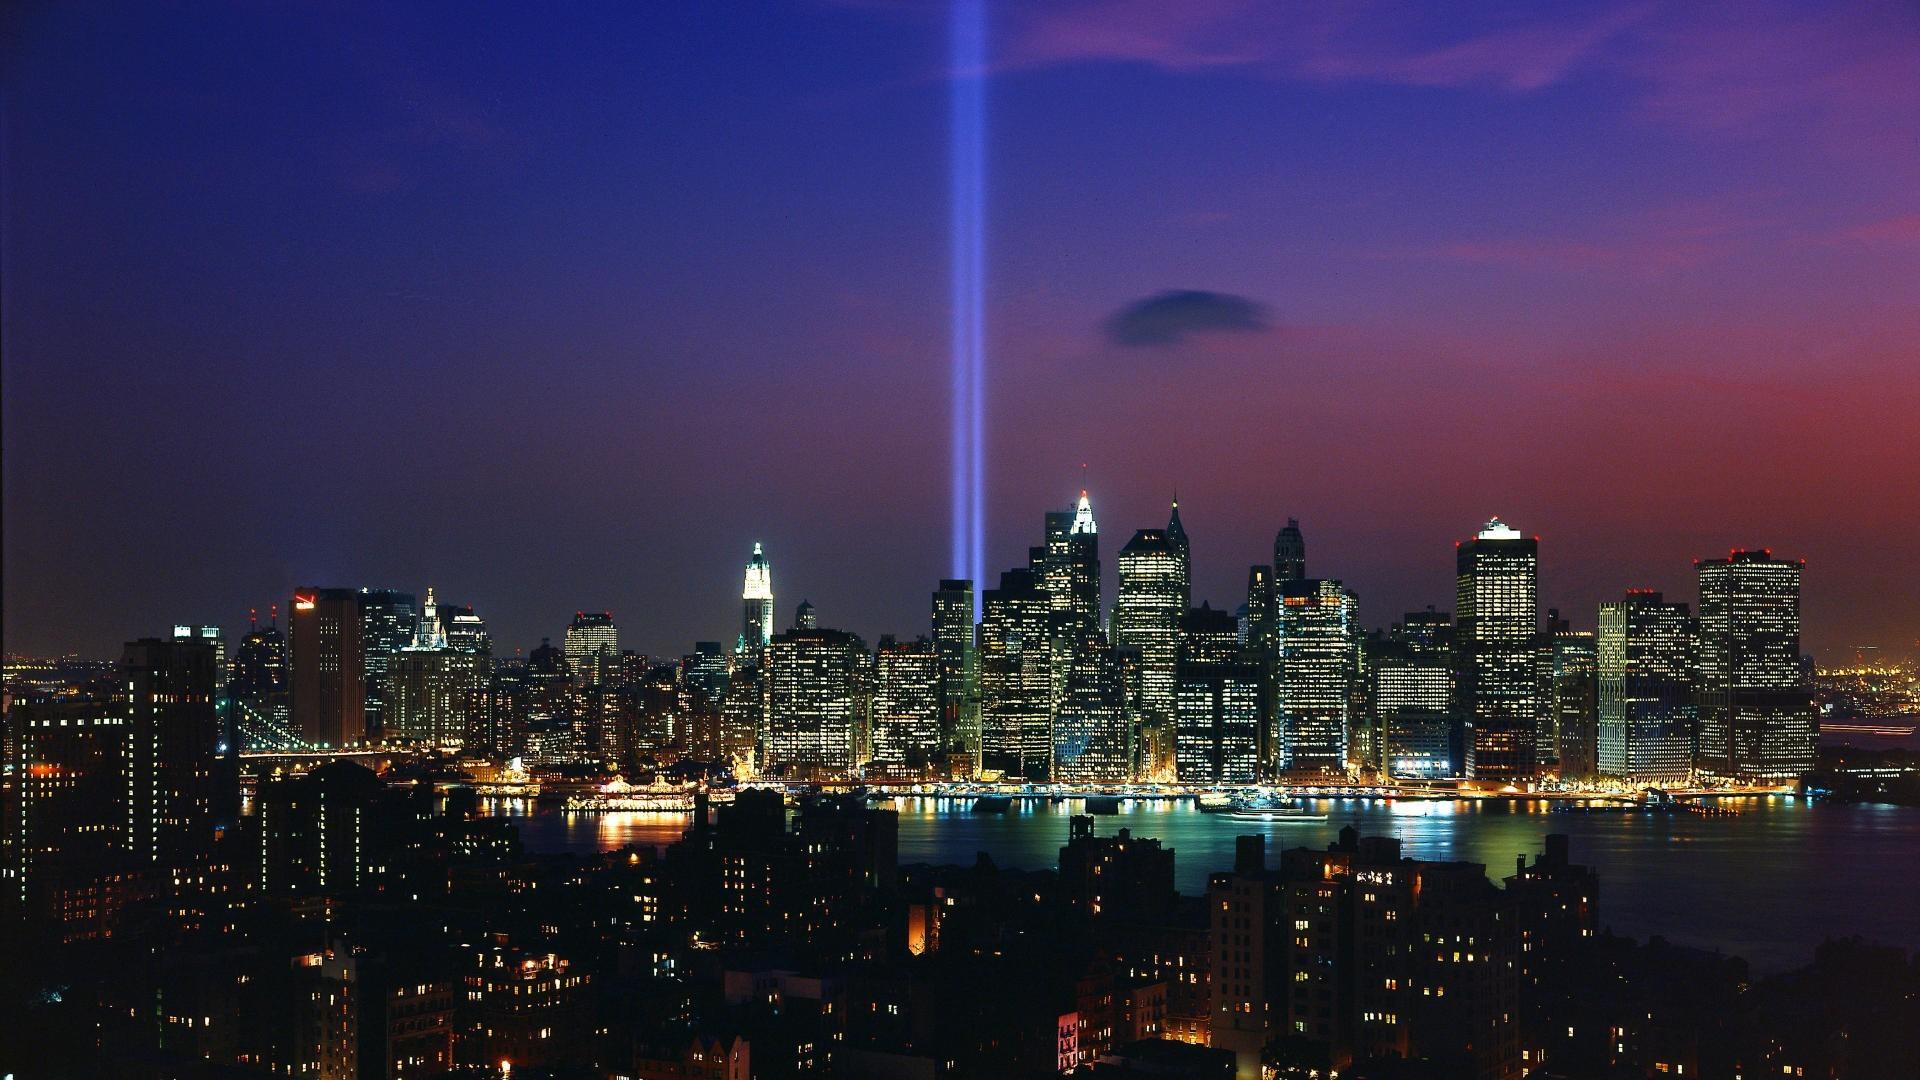 New York City lights wallpaper   631826 1920x1080